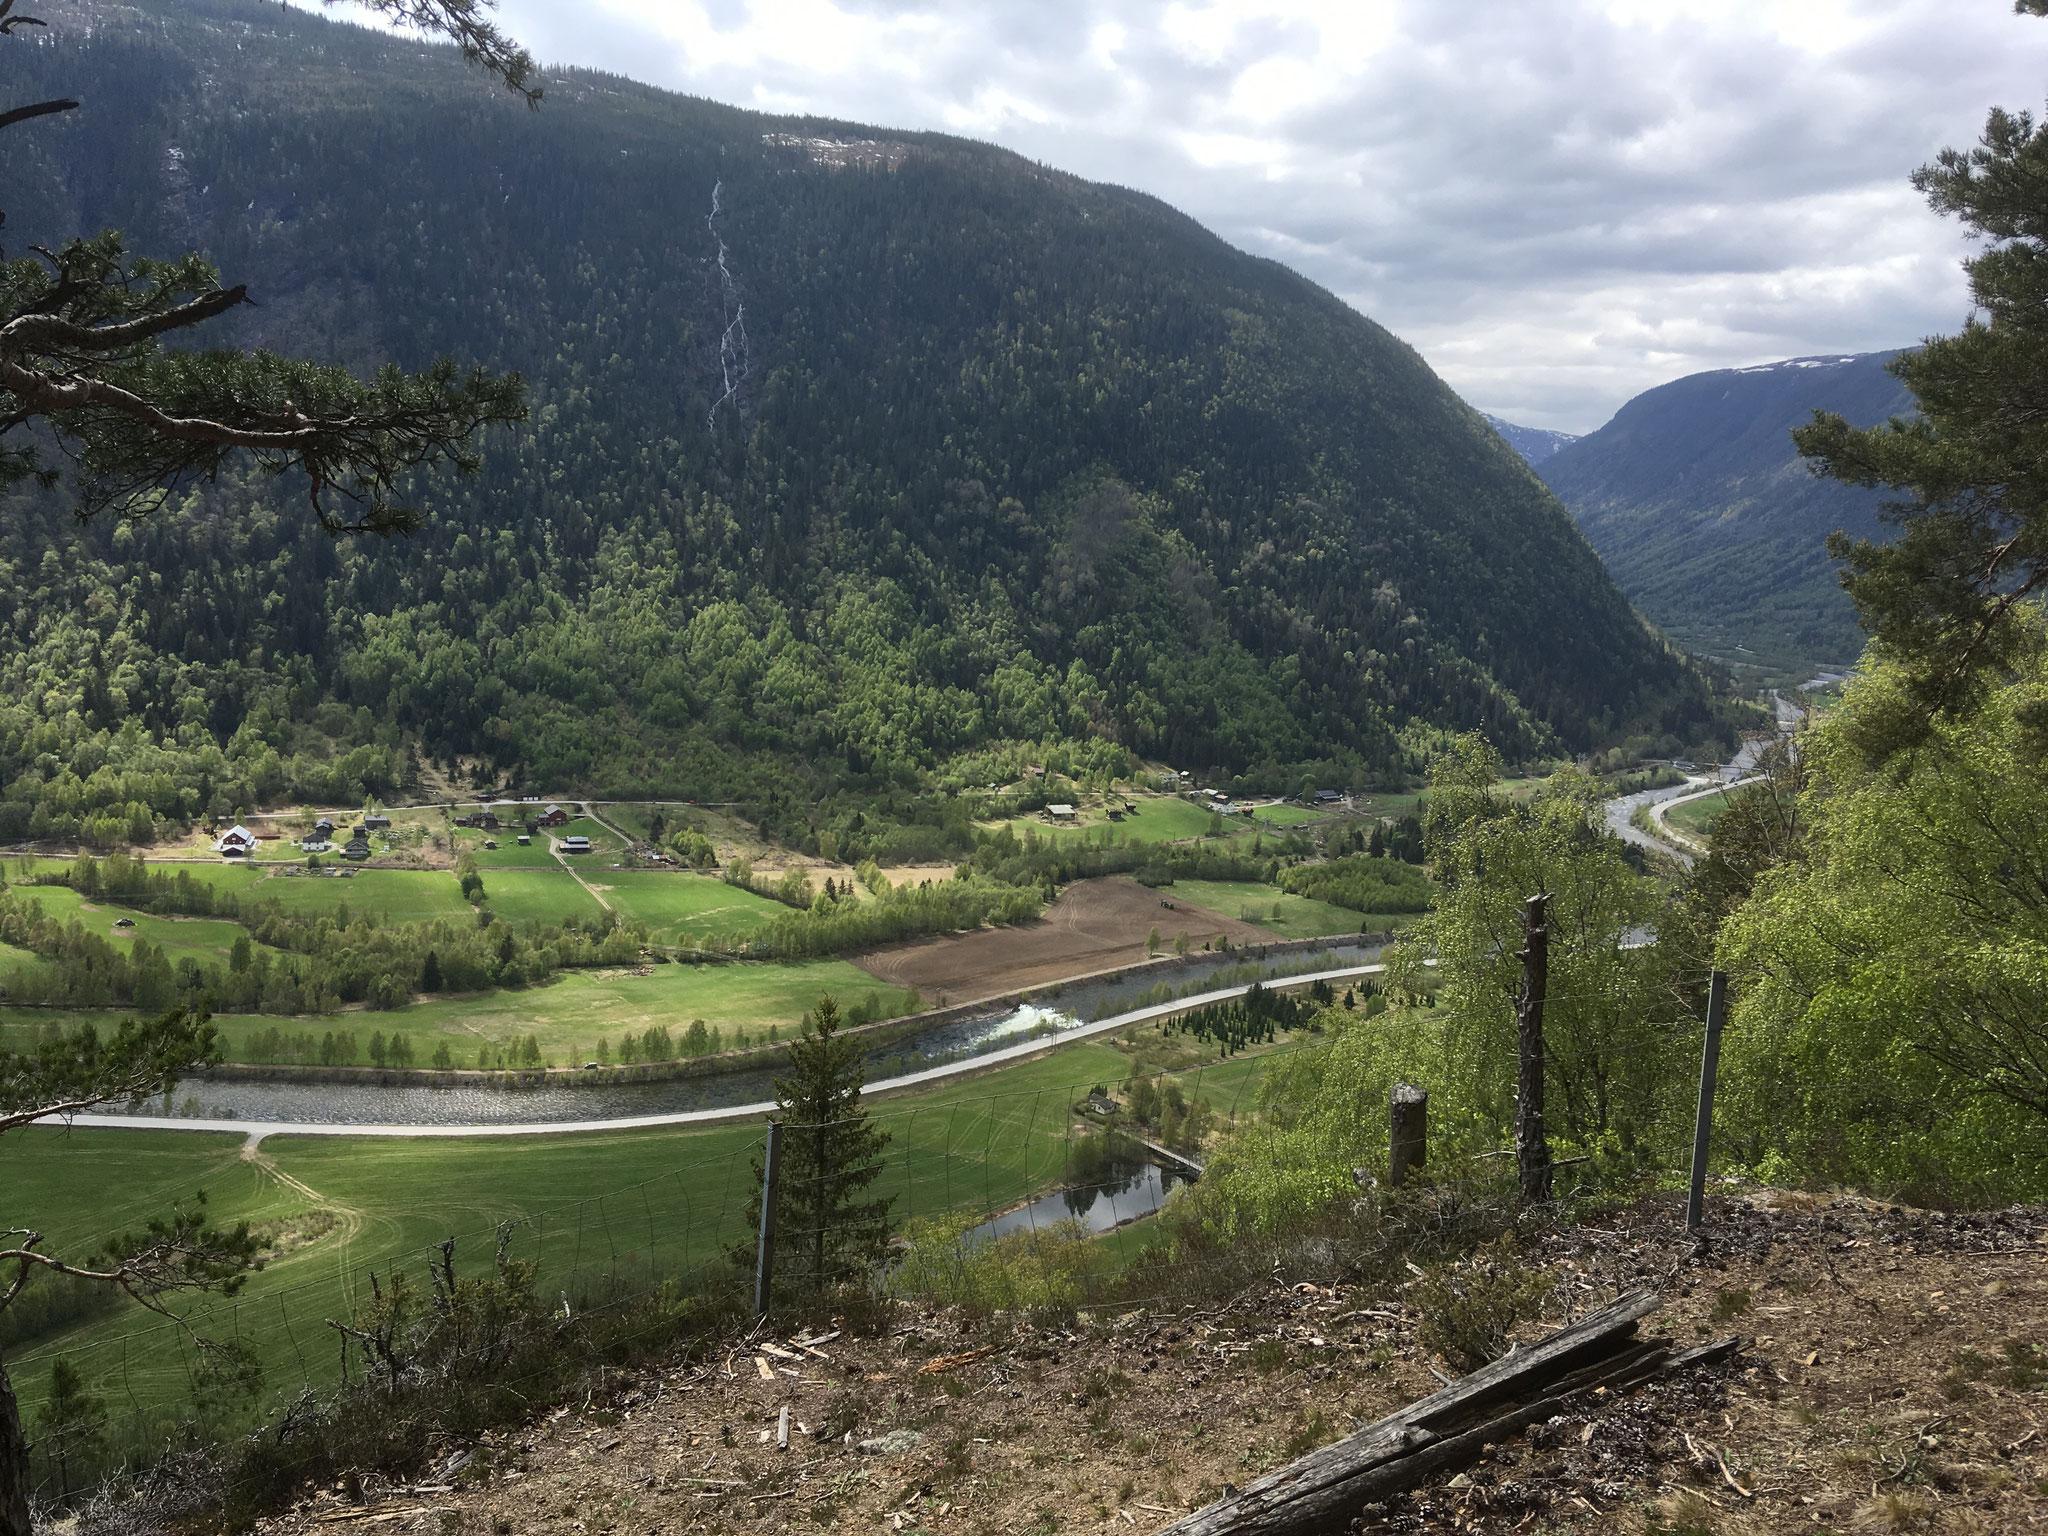 view along Vestfjorddalen towards Rjukan